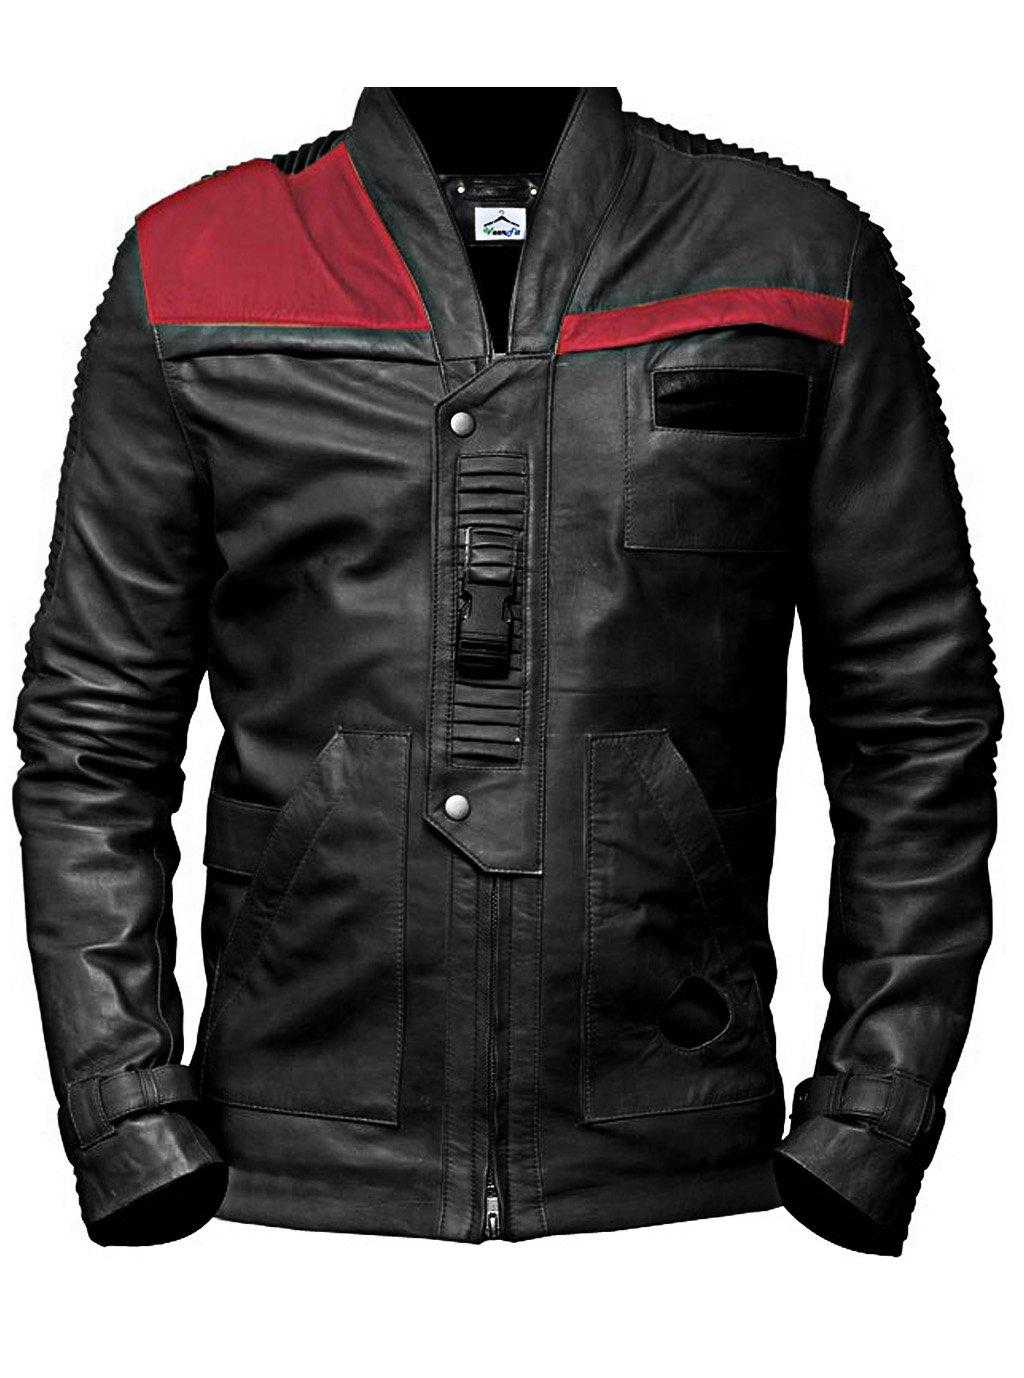 VearFit Star Wars Finn Regular Big & Tall Size Black Genuine Mens leather jacket, Large, Black